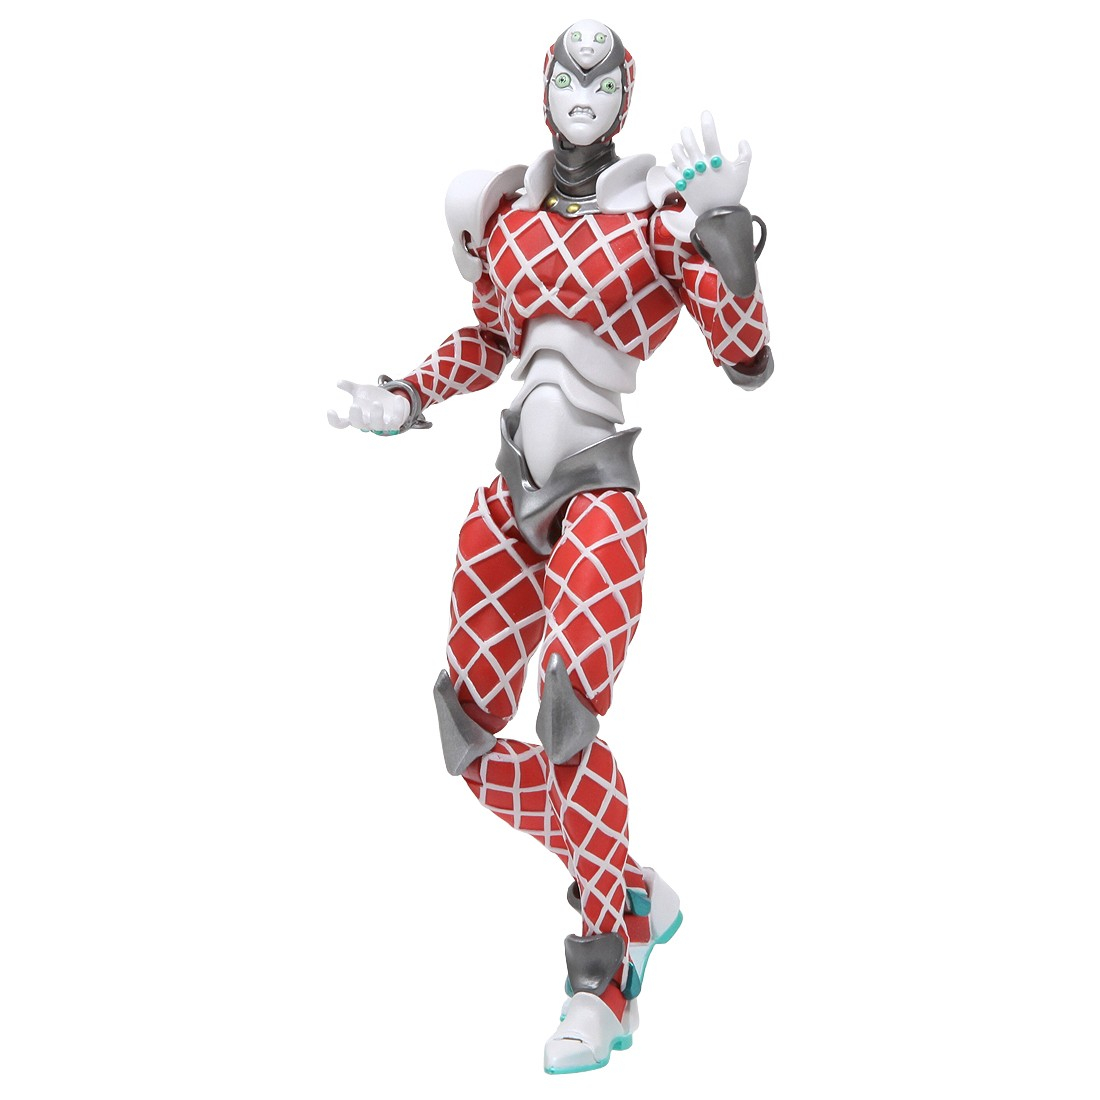 Medicos Super Action Statue JoJo's Bizarre Adventure King Crimson Figure (red)